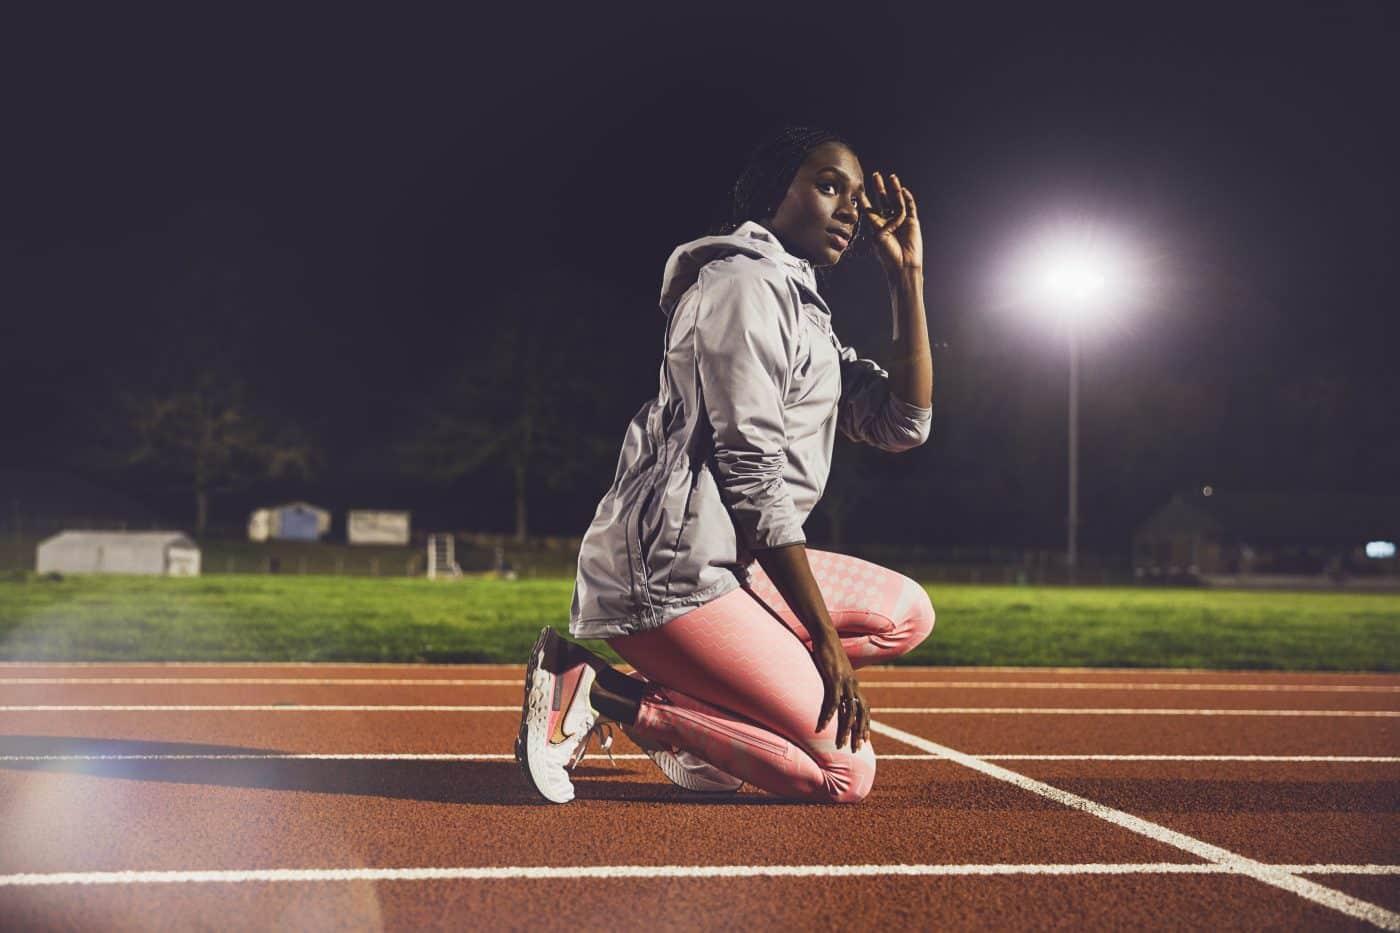 Dina-Asher-Smith-Nike-React-Infinity-Run-Runpack-Tokyo-11